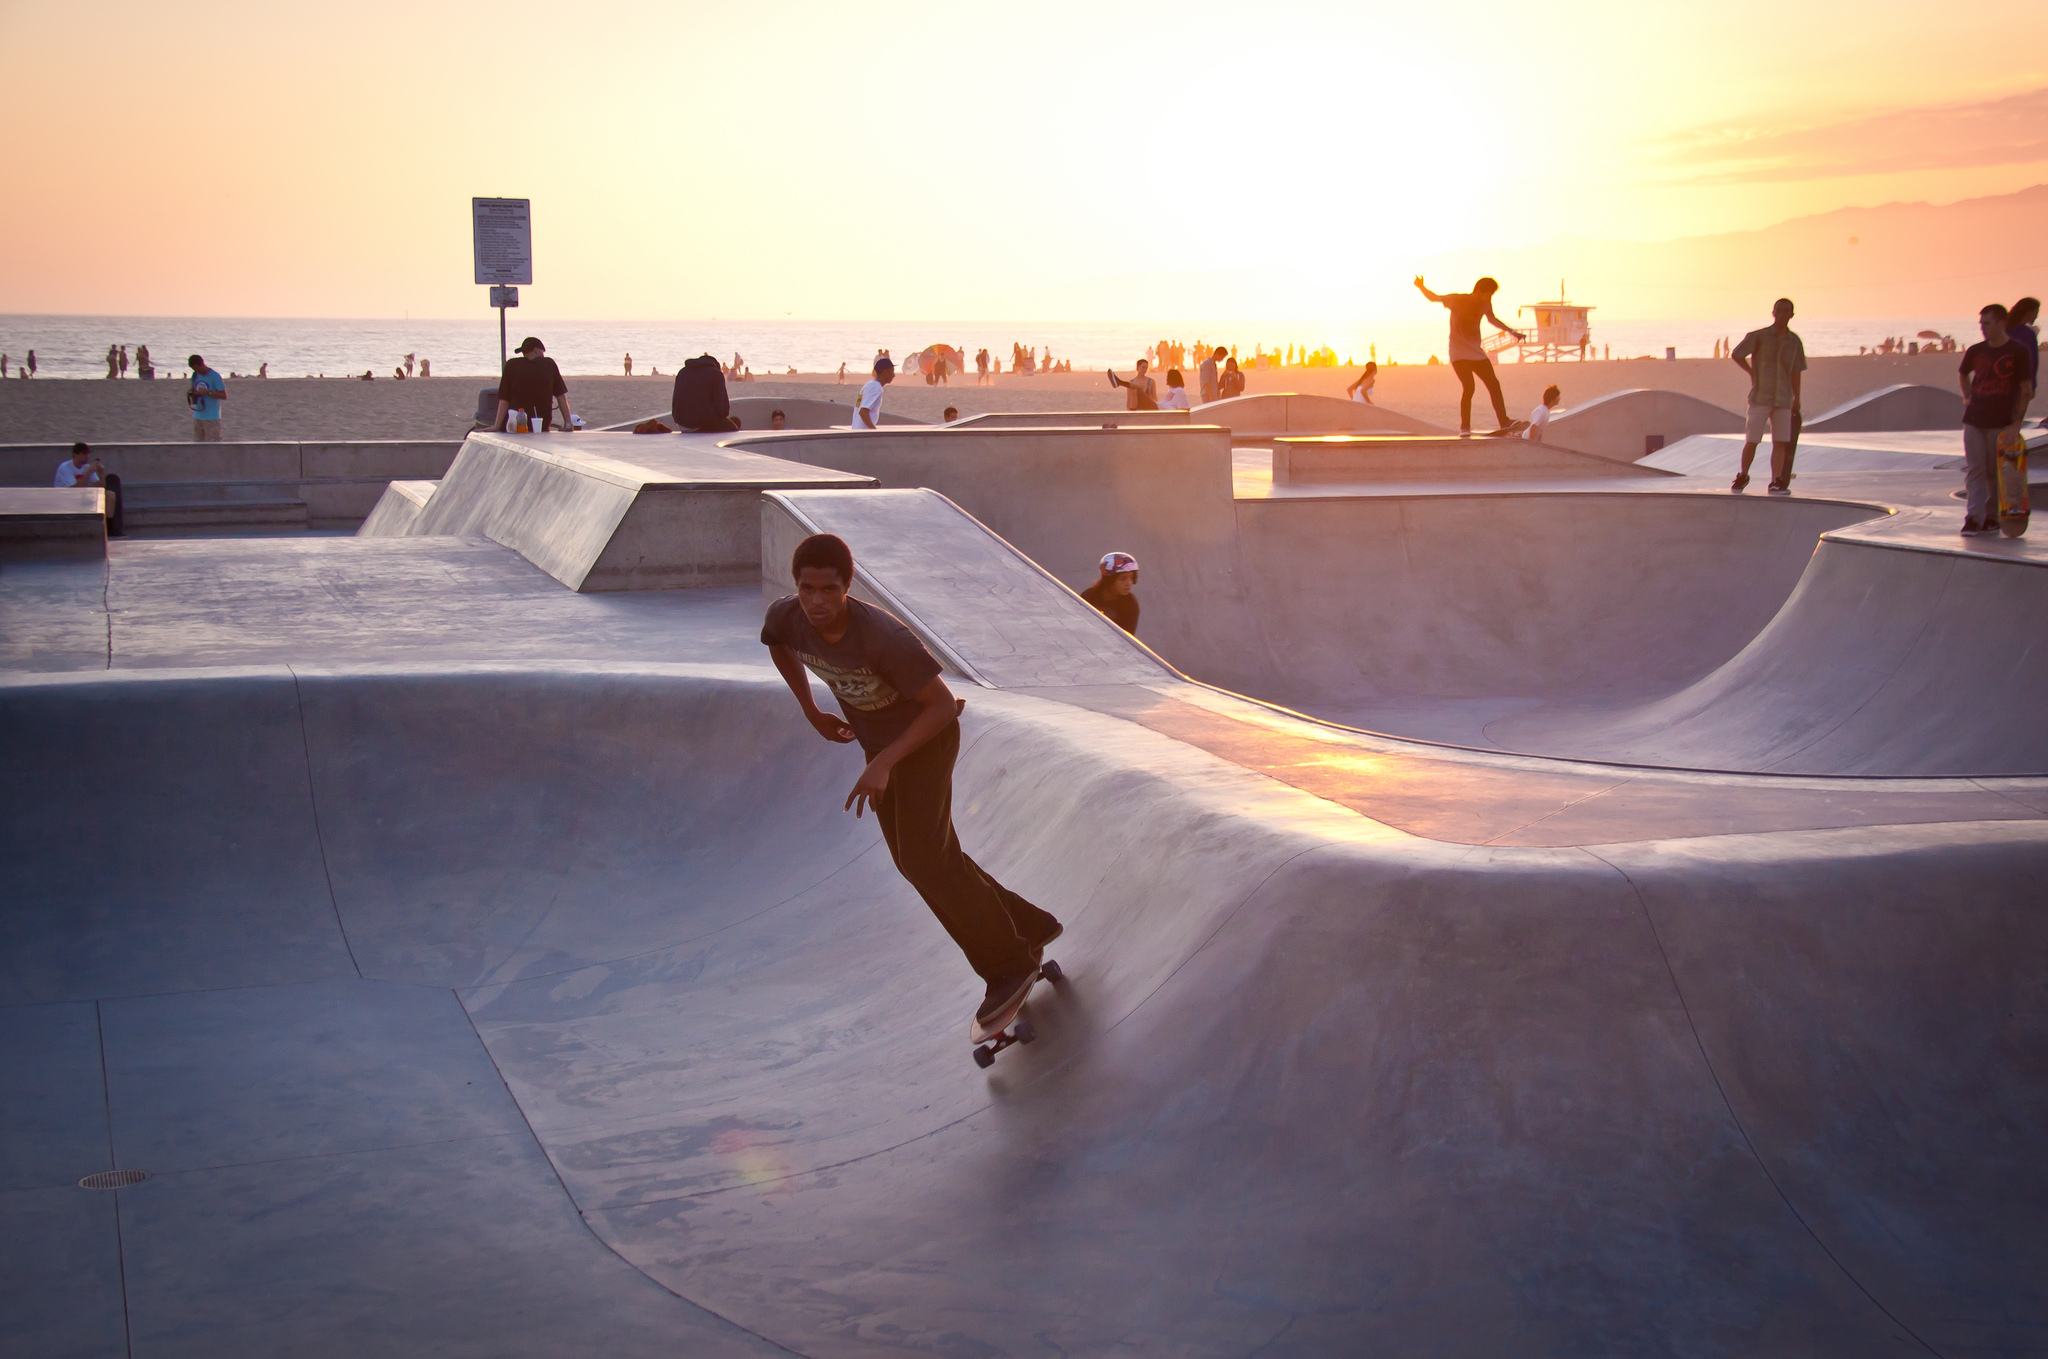 Pista de skate na Venice Beach, Los Angeles (foto: Chris Goldberg/Flickr/creative commons)